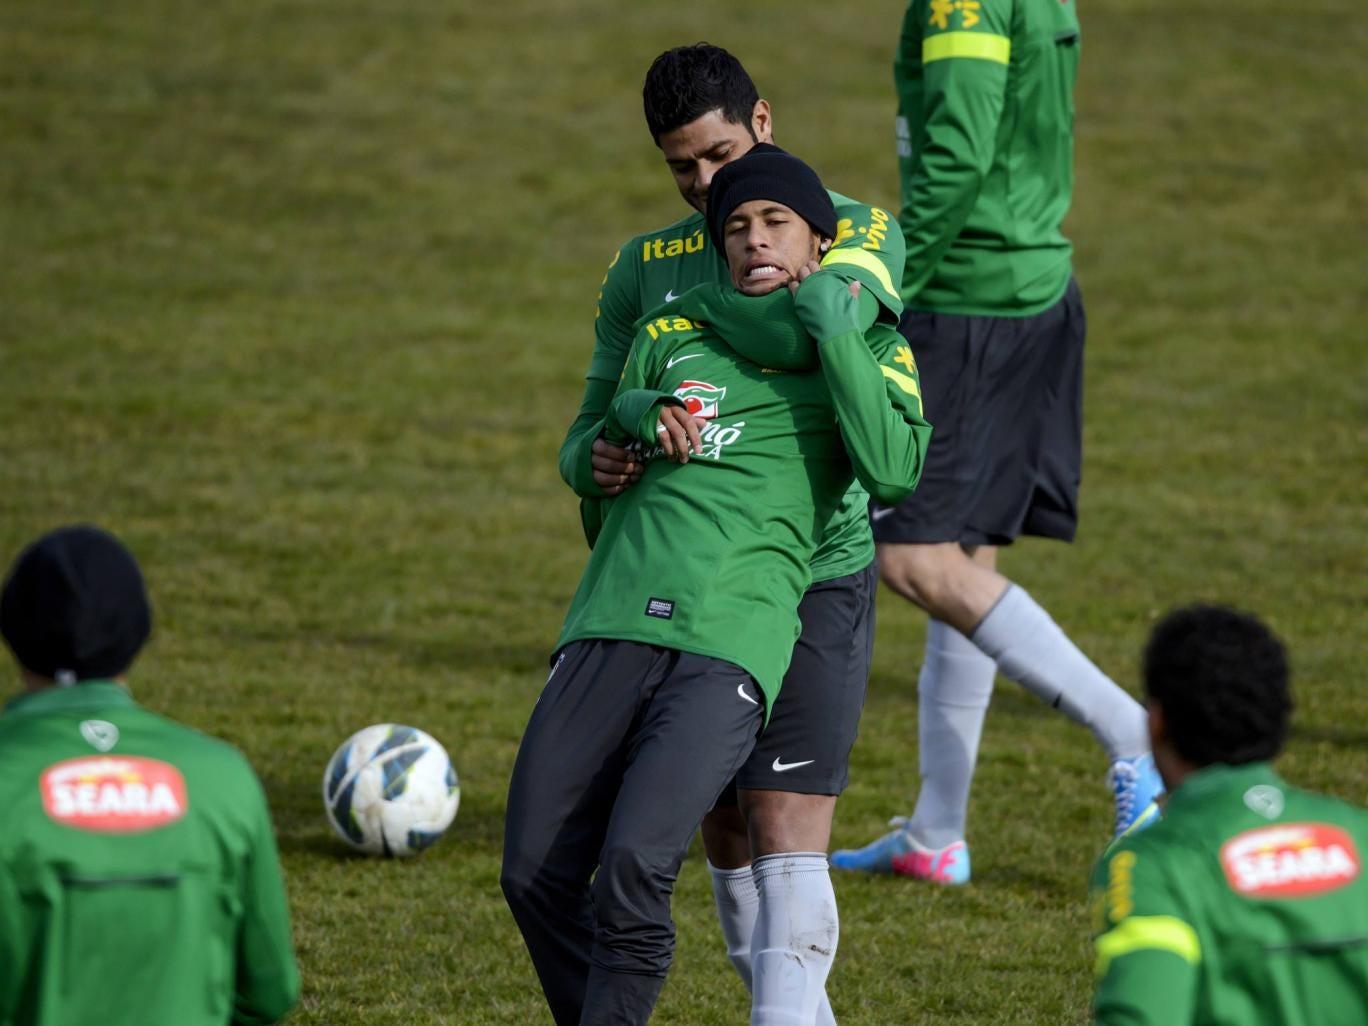 Brazilian national football team forward Hulk (up) plays with Brazilian forward Neymar